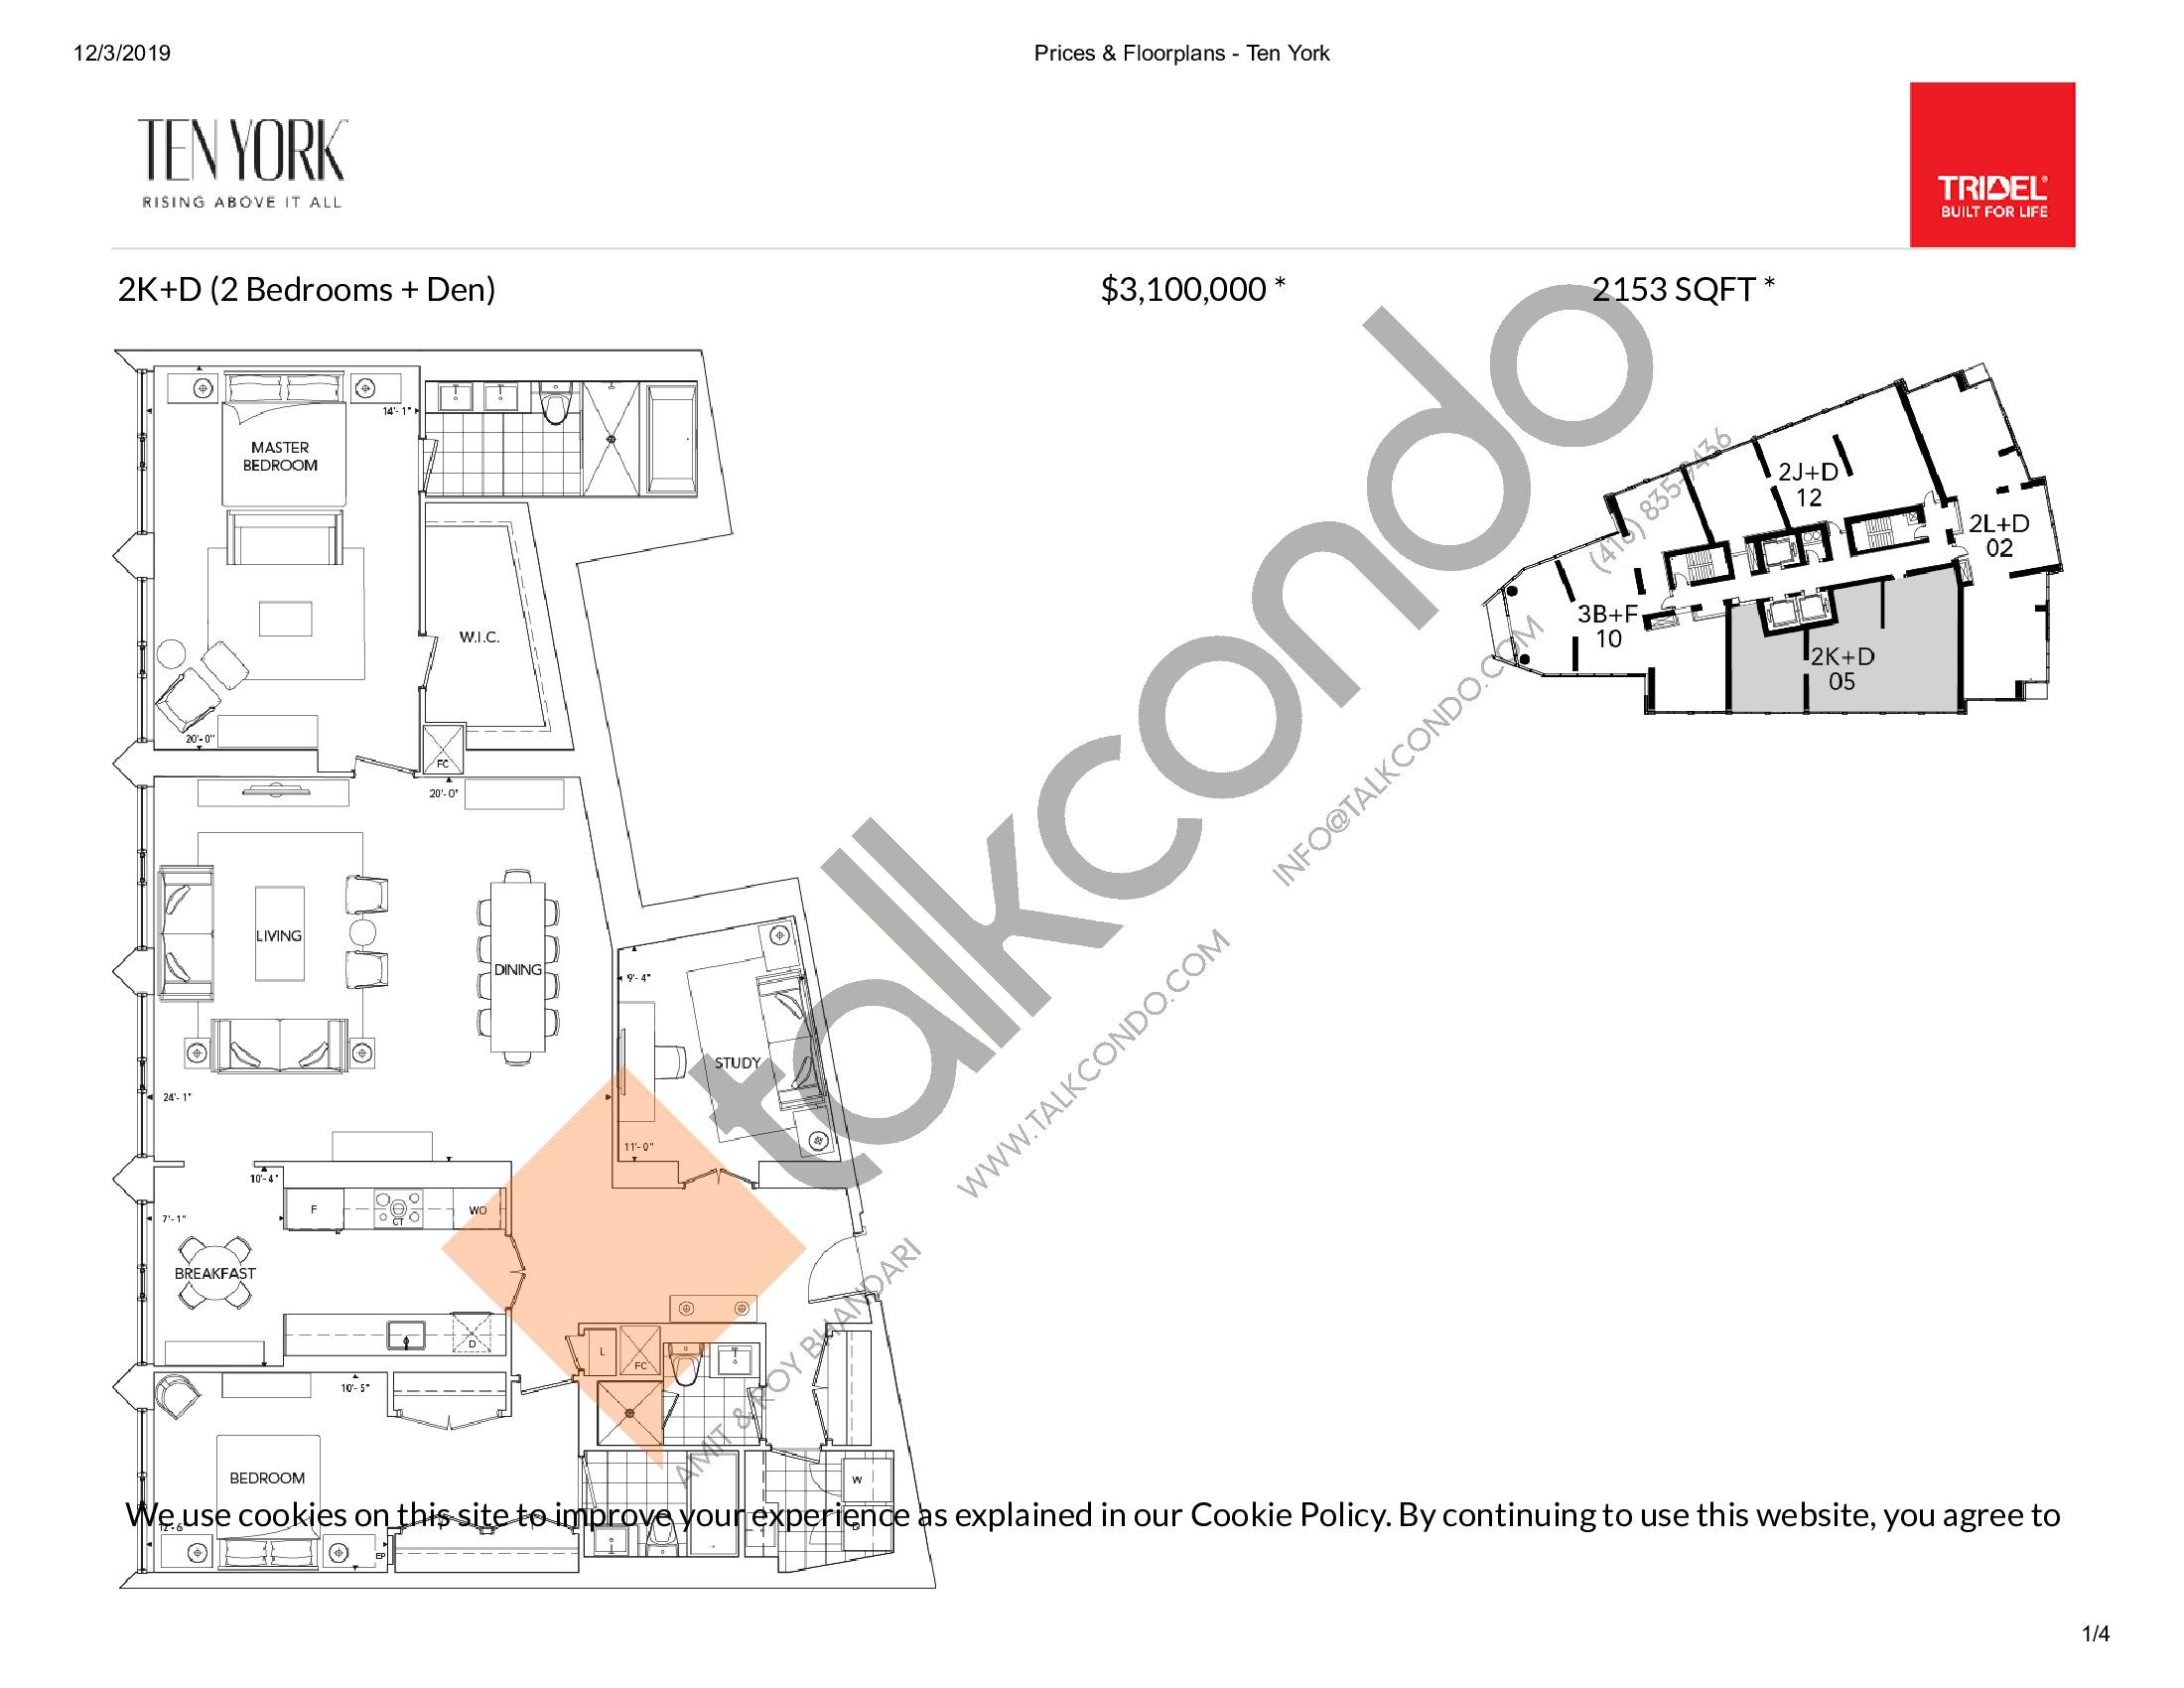 2K+D Floor Plan at Ten York Condos - 2153 sq.ft